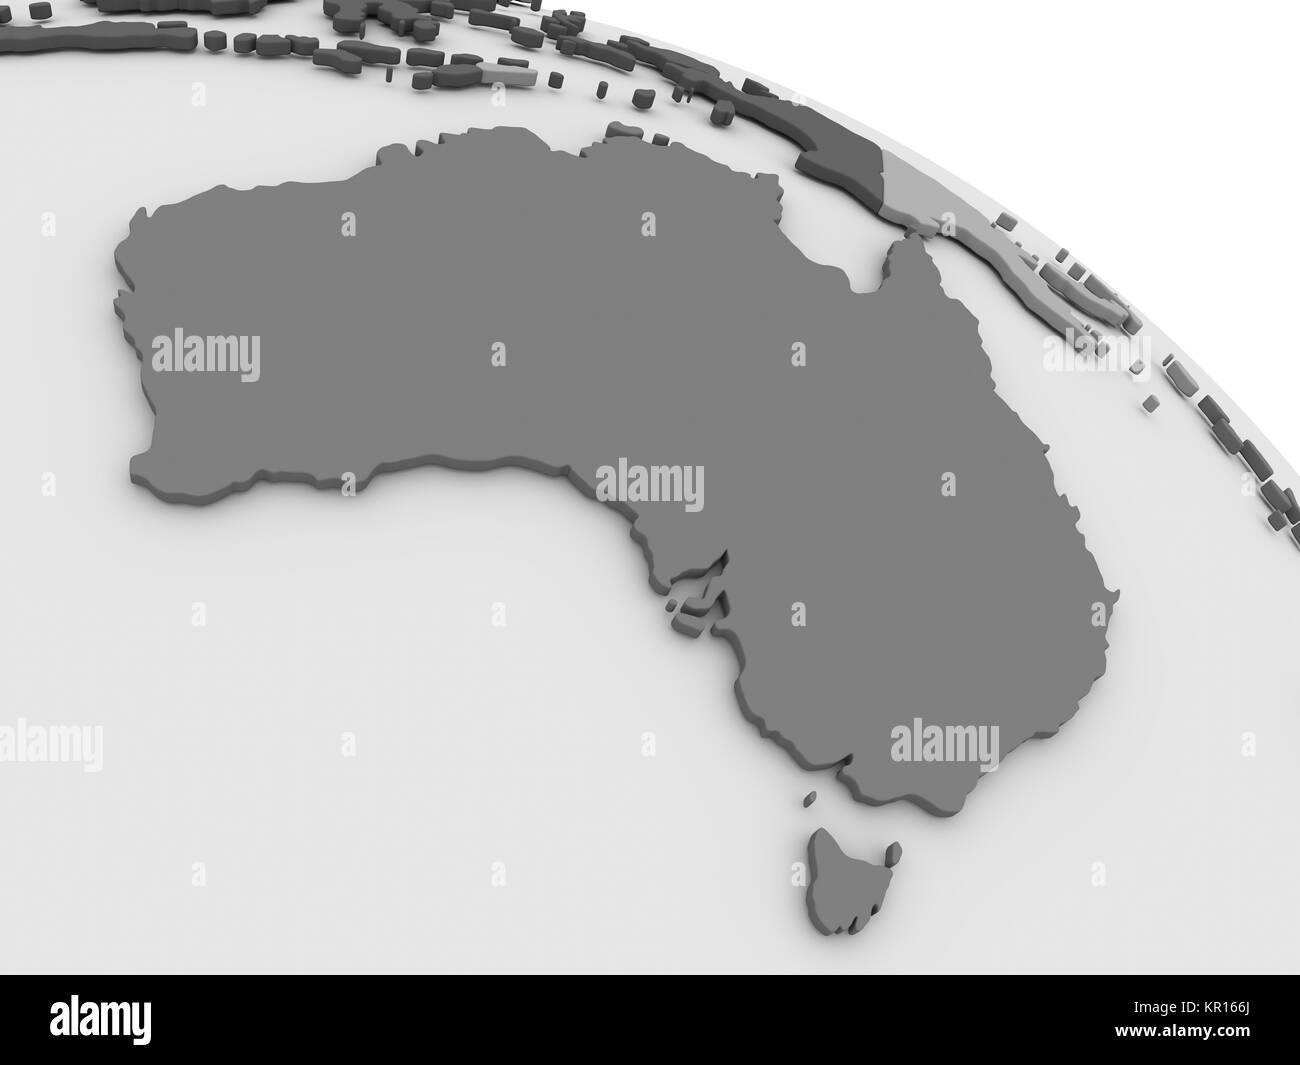 Australia Map Grey.Australia On Grey 3d Map Stock Photo 169057242 Alamy